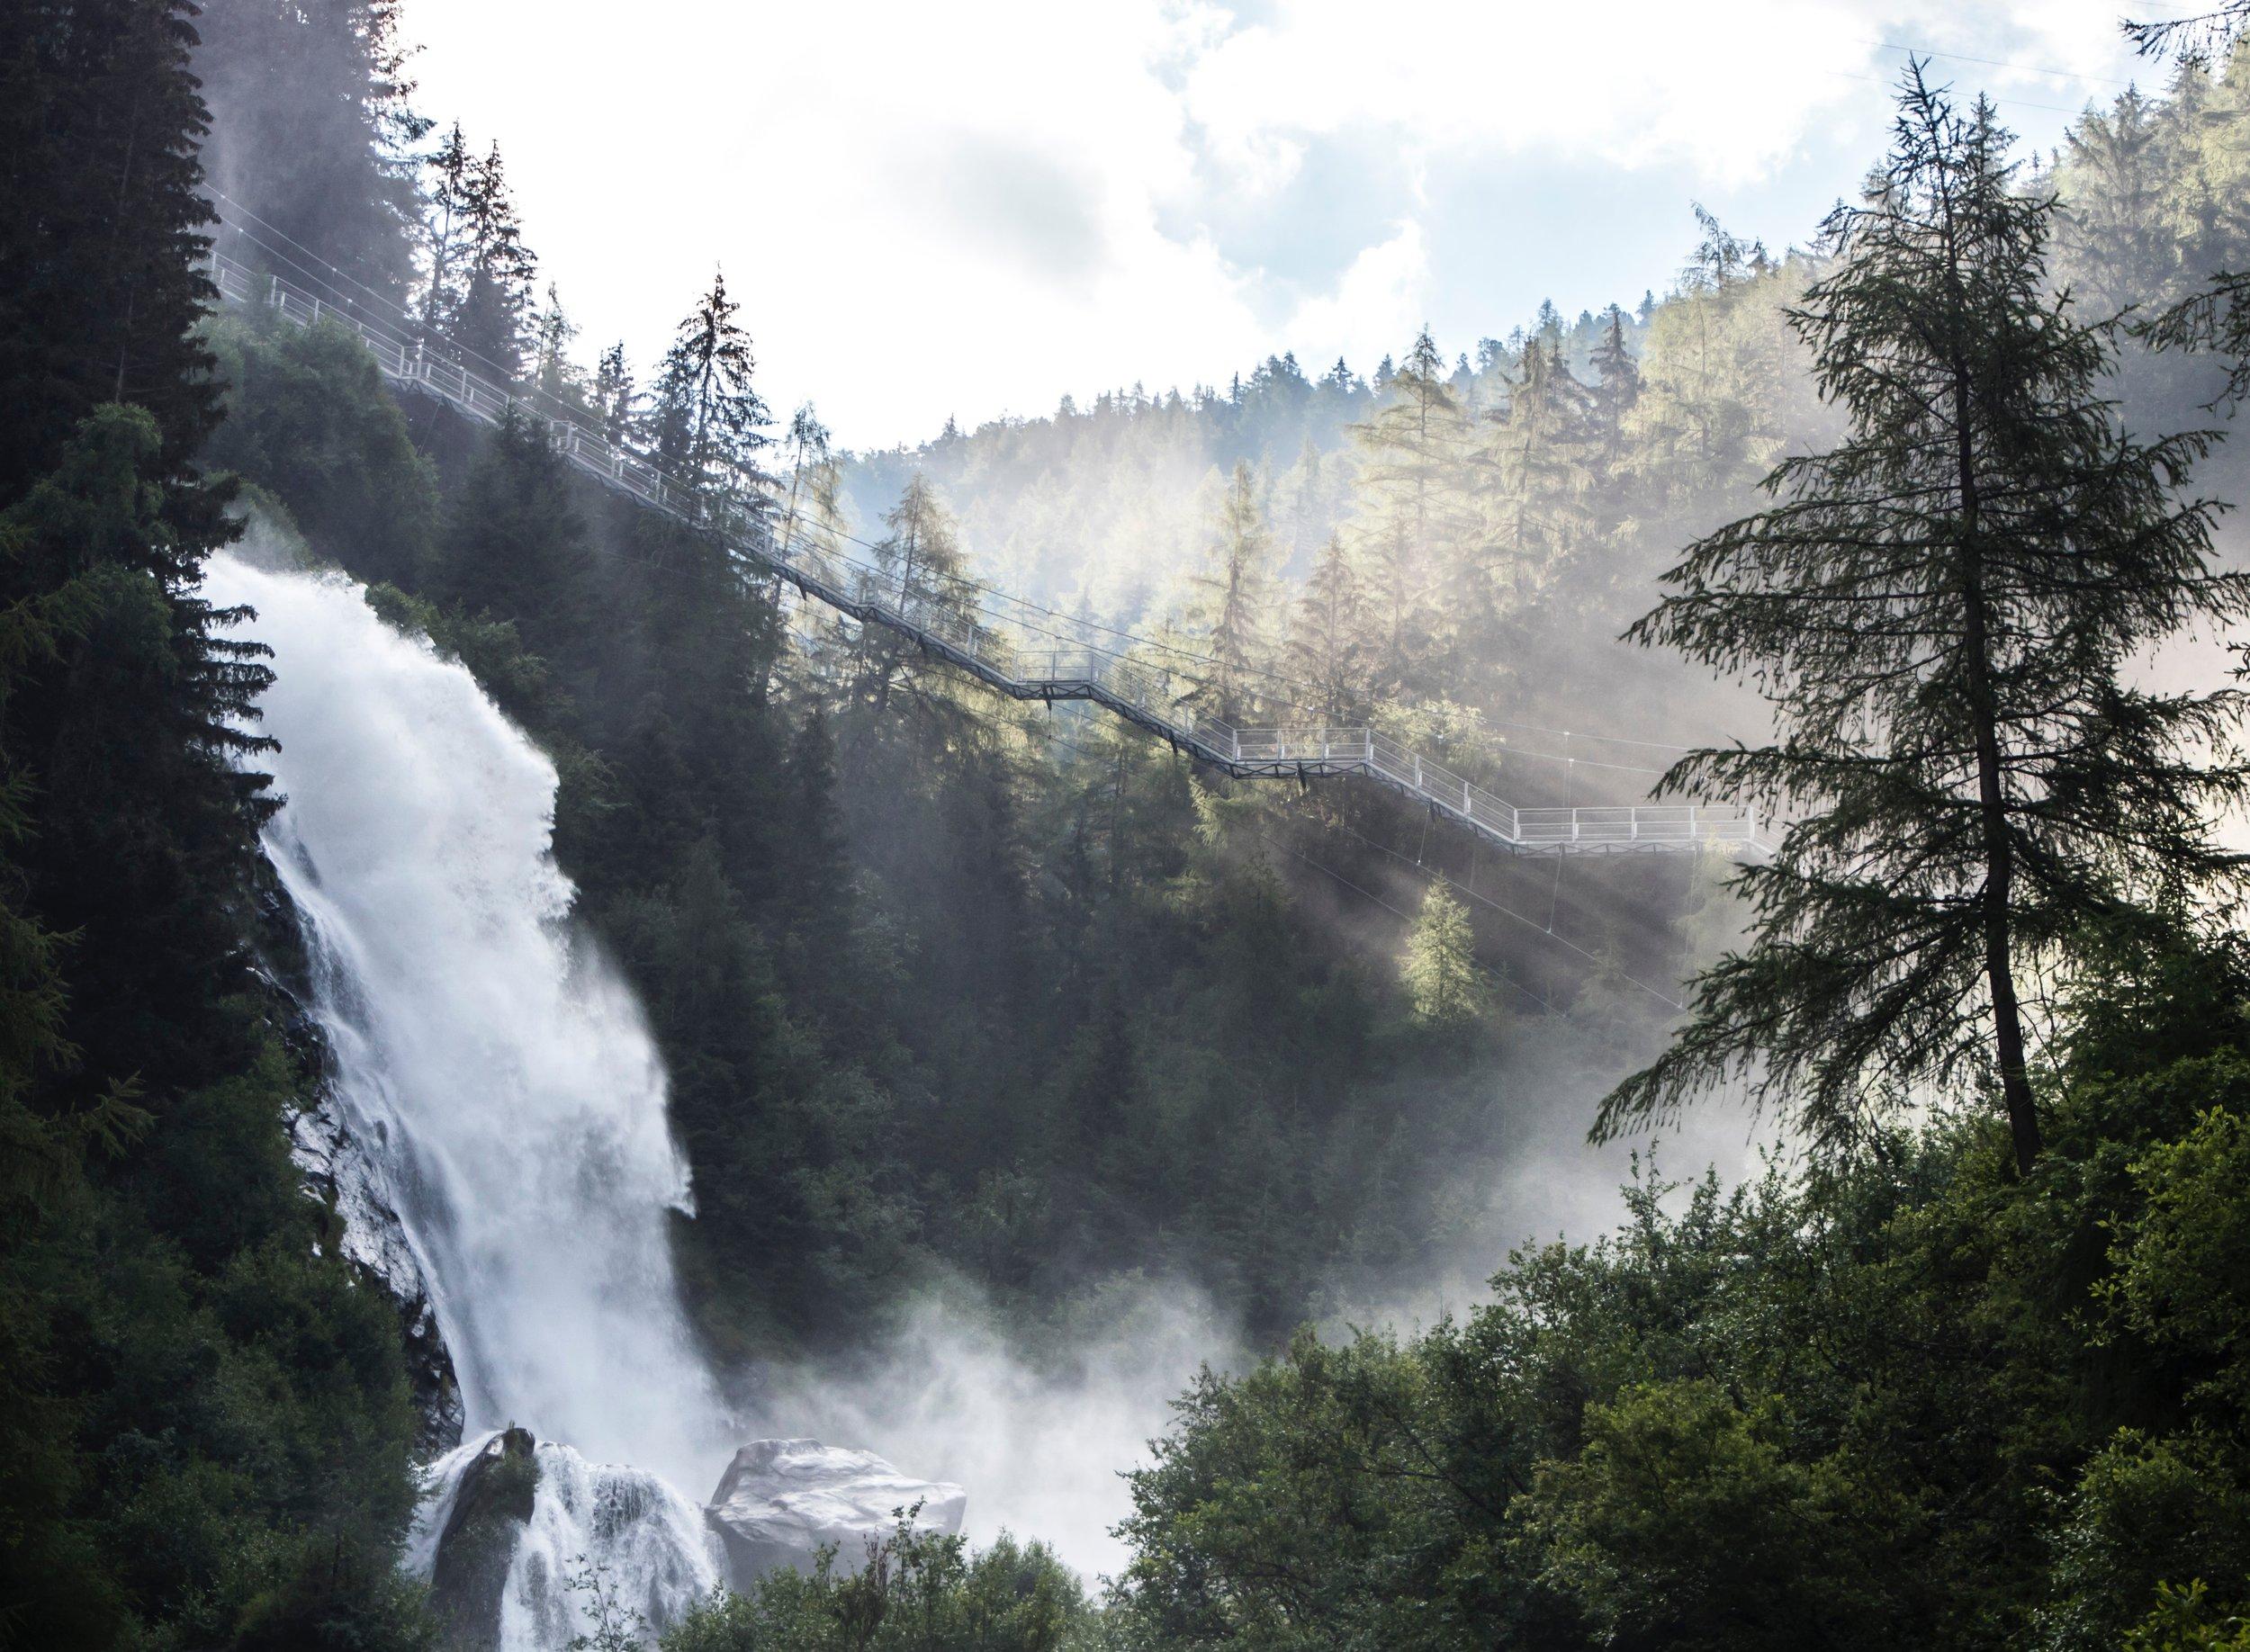 Stuibenfall Wasserfall, Ötztal, Bäume, berge.jpg